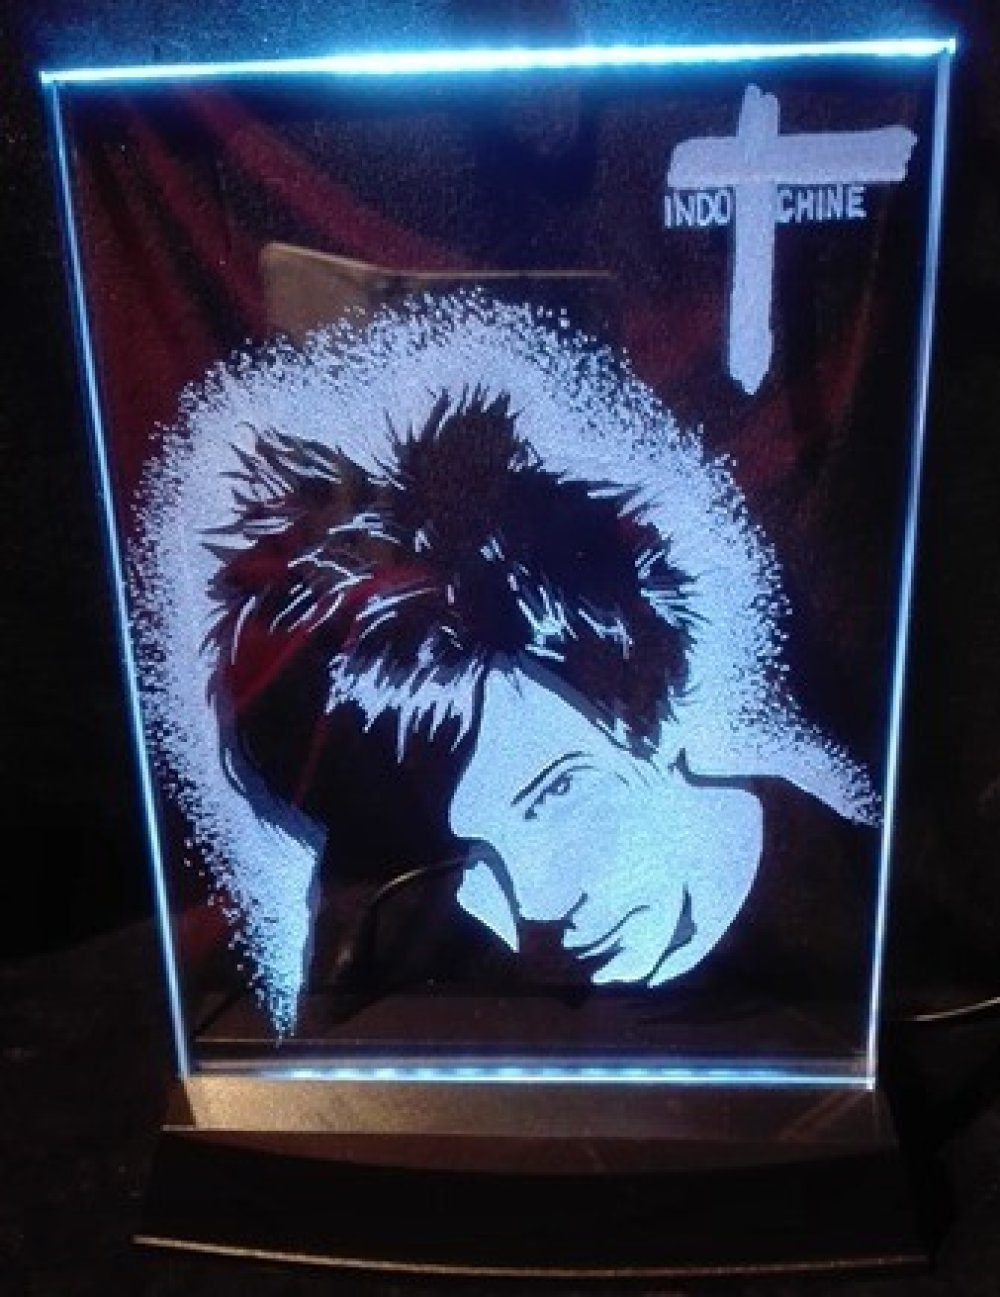 Gravure sur verre Cadre Lumineux  Indochine